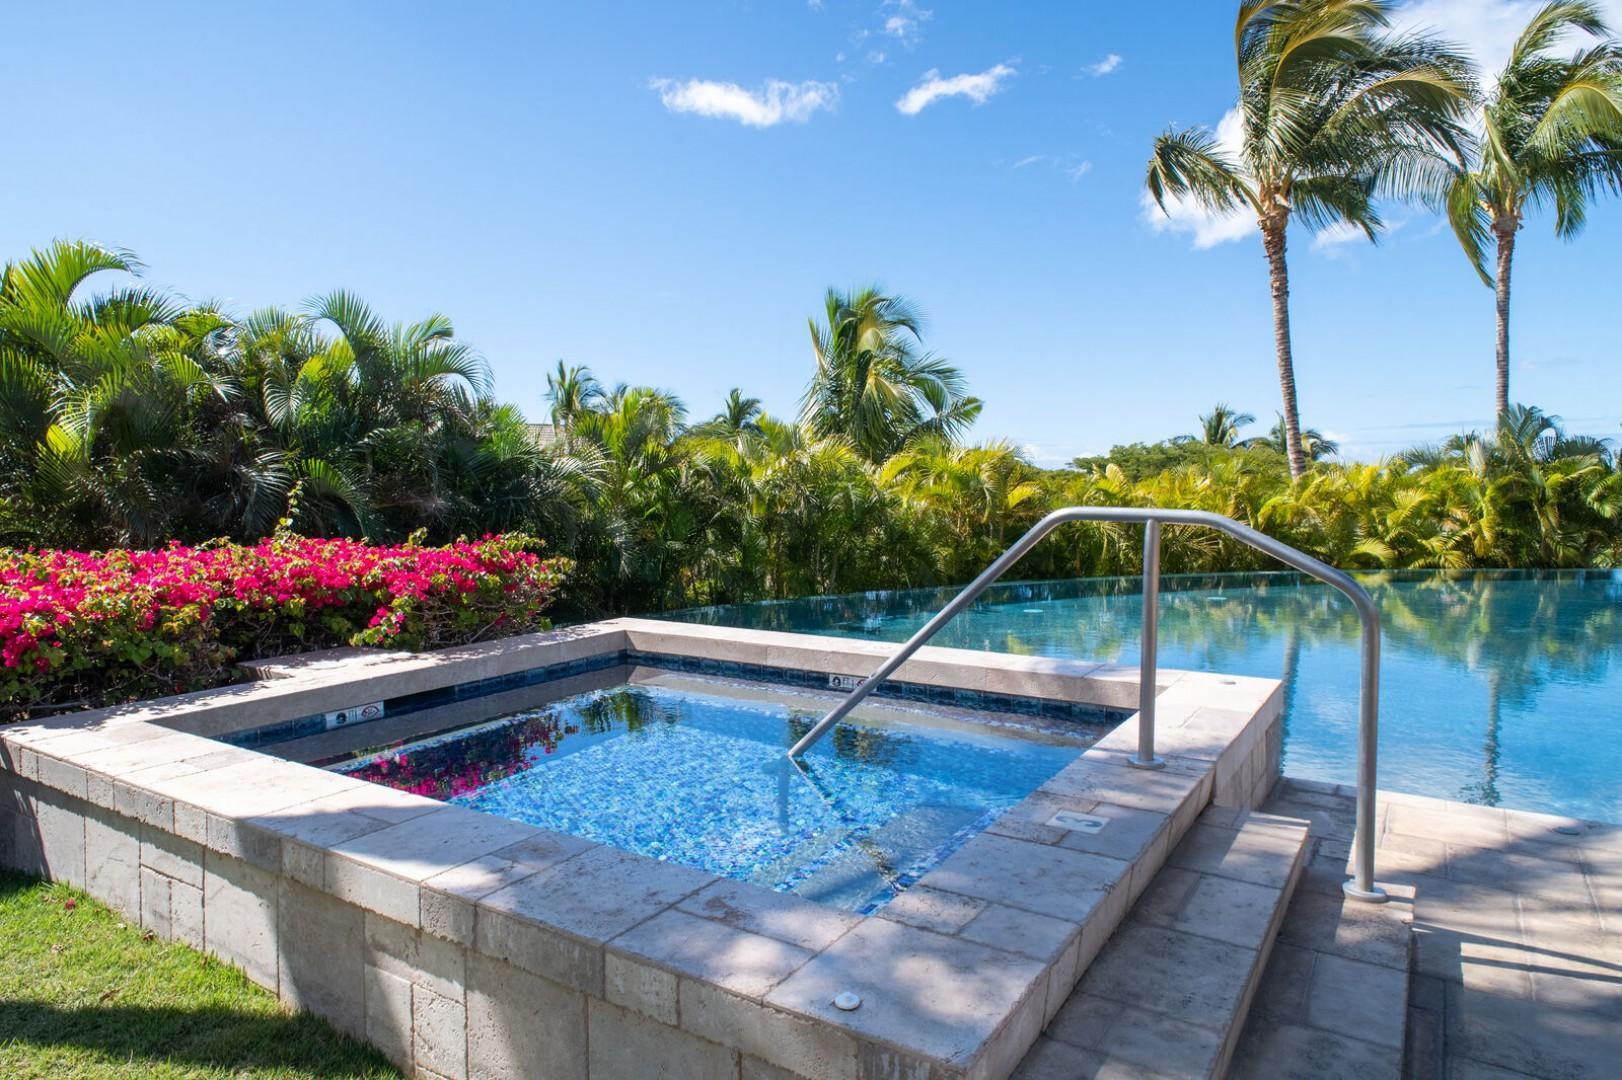 Wai'ula'ua Amenities Center: View of shared pool featuring jacuzzi.